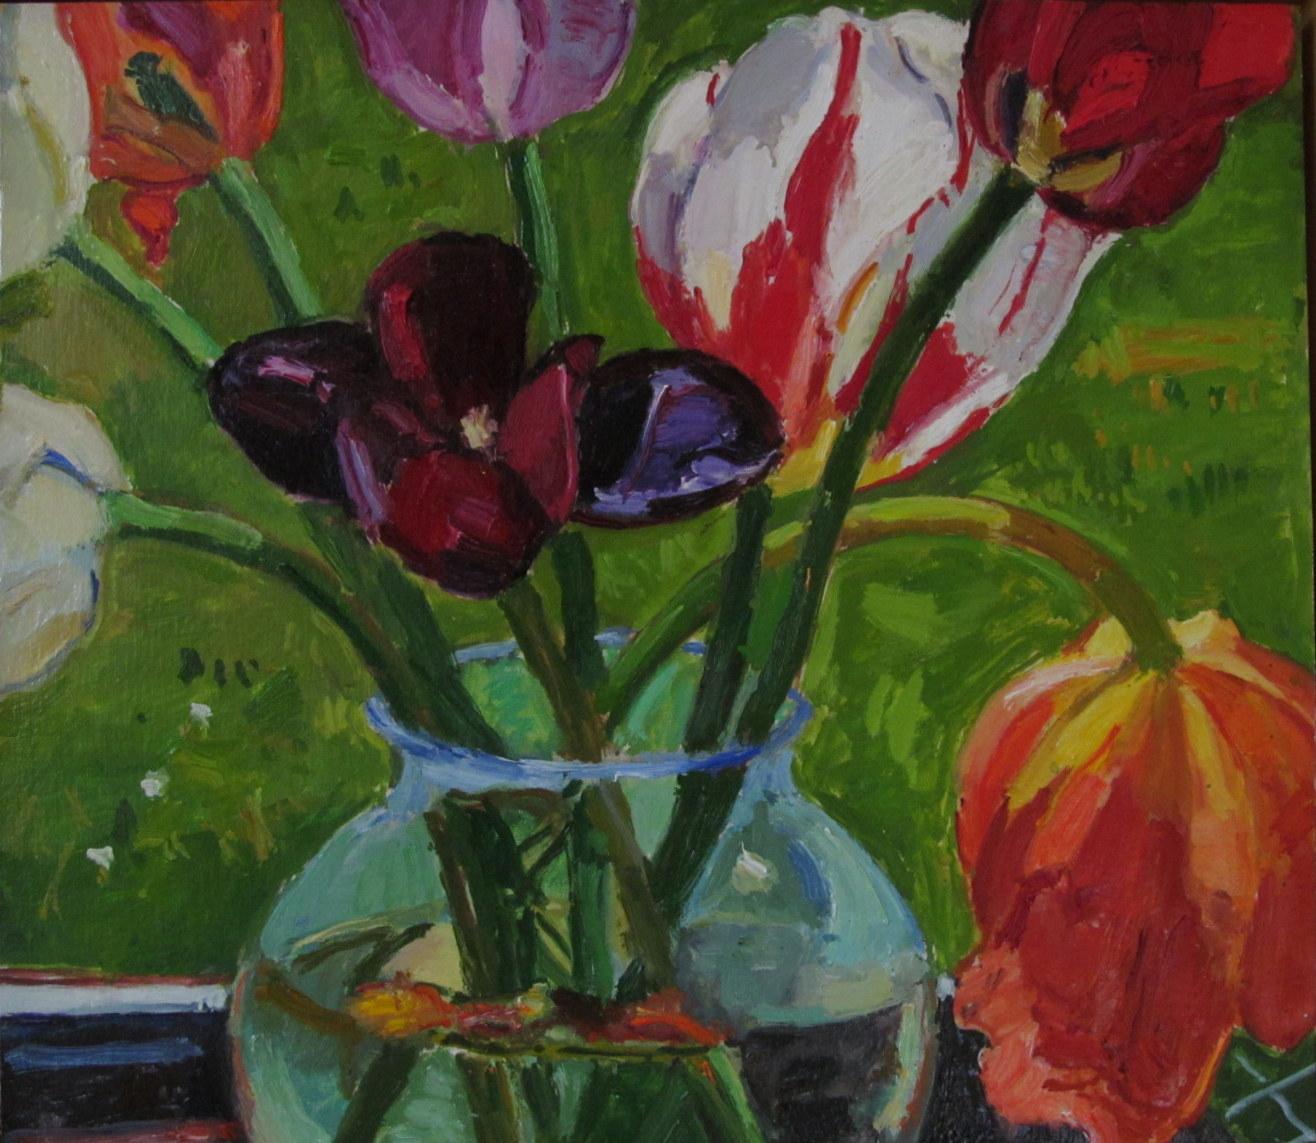 Tulips, 2014